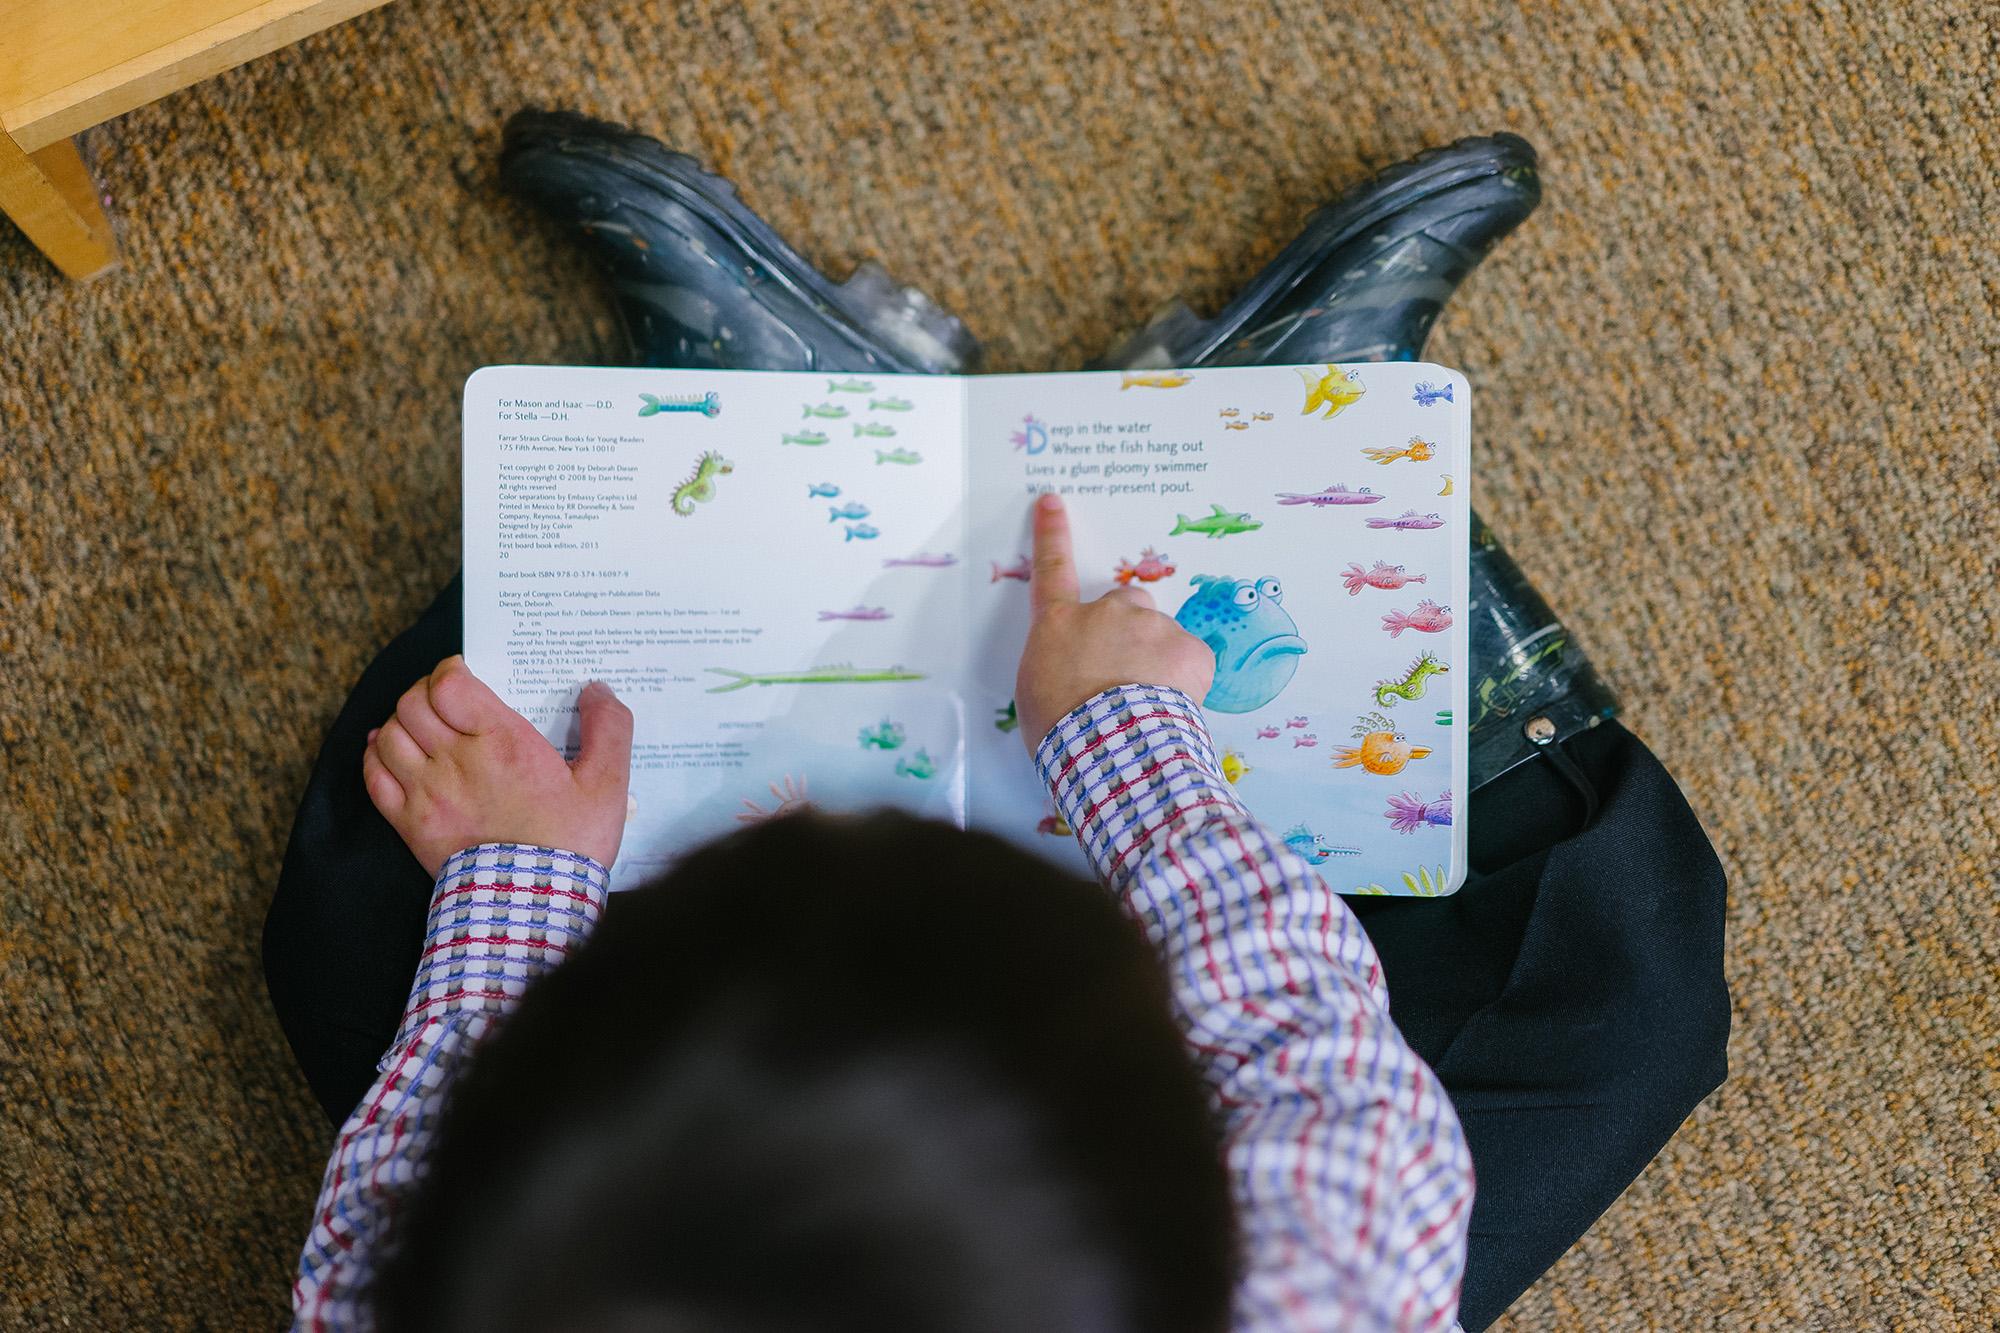 isolation activities for children, reading